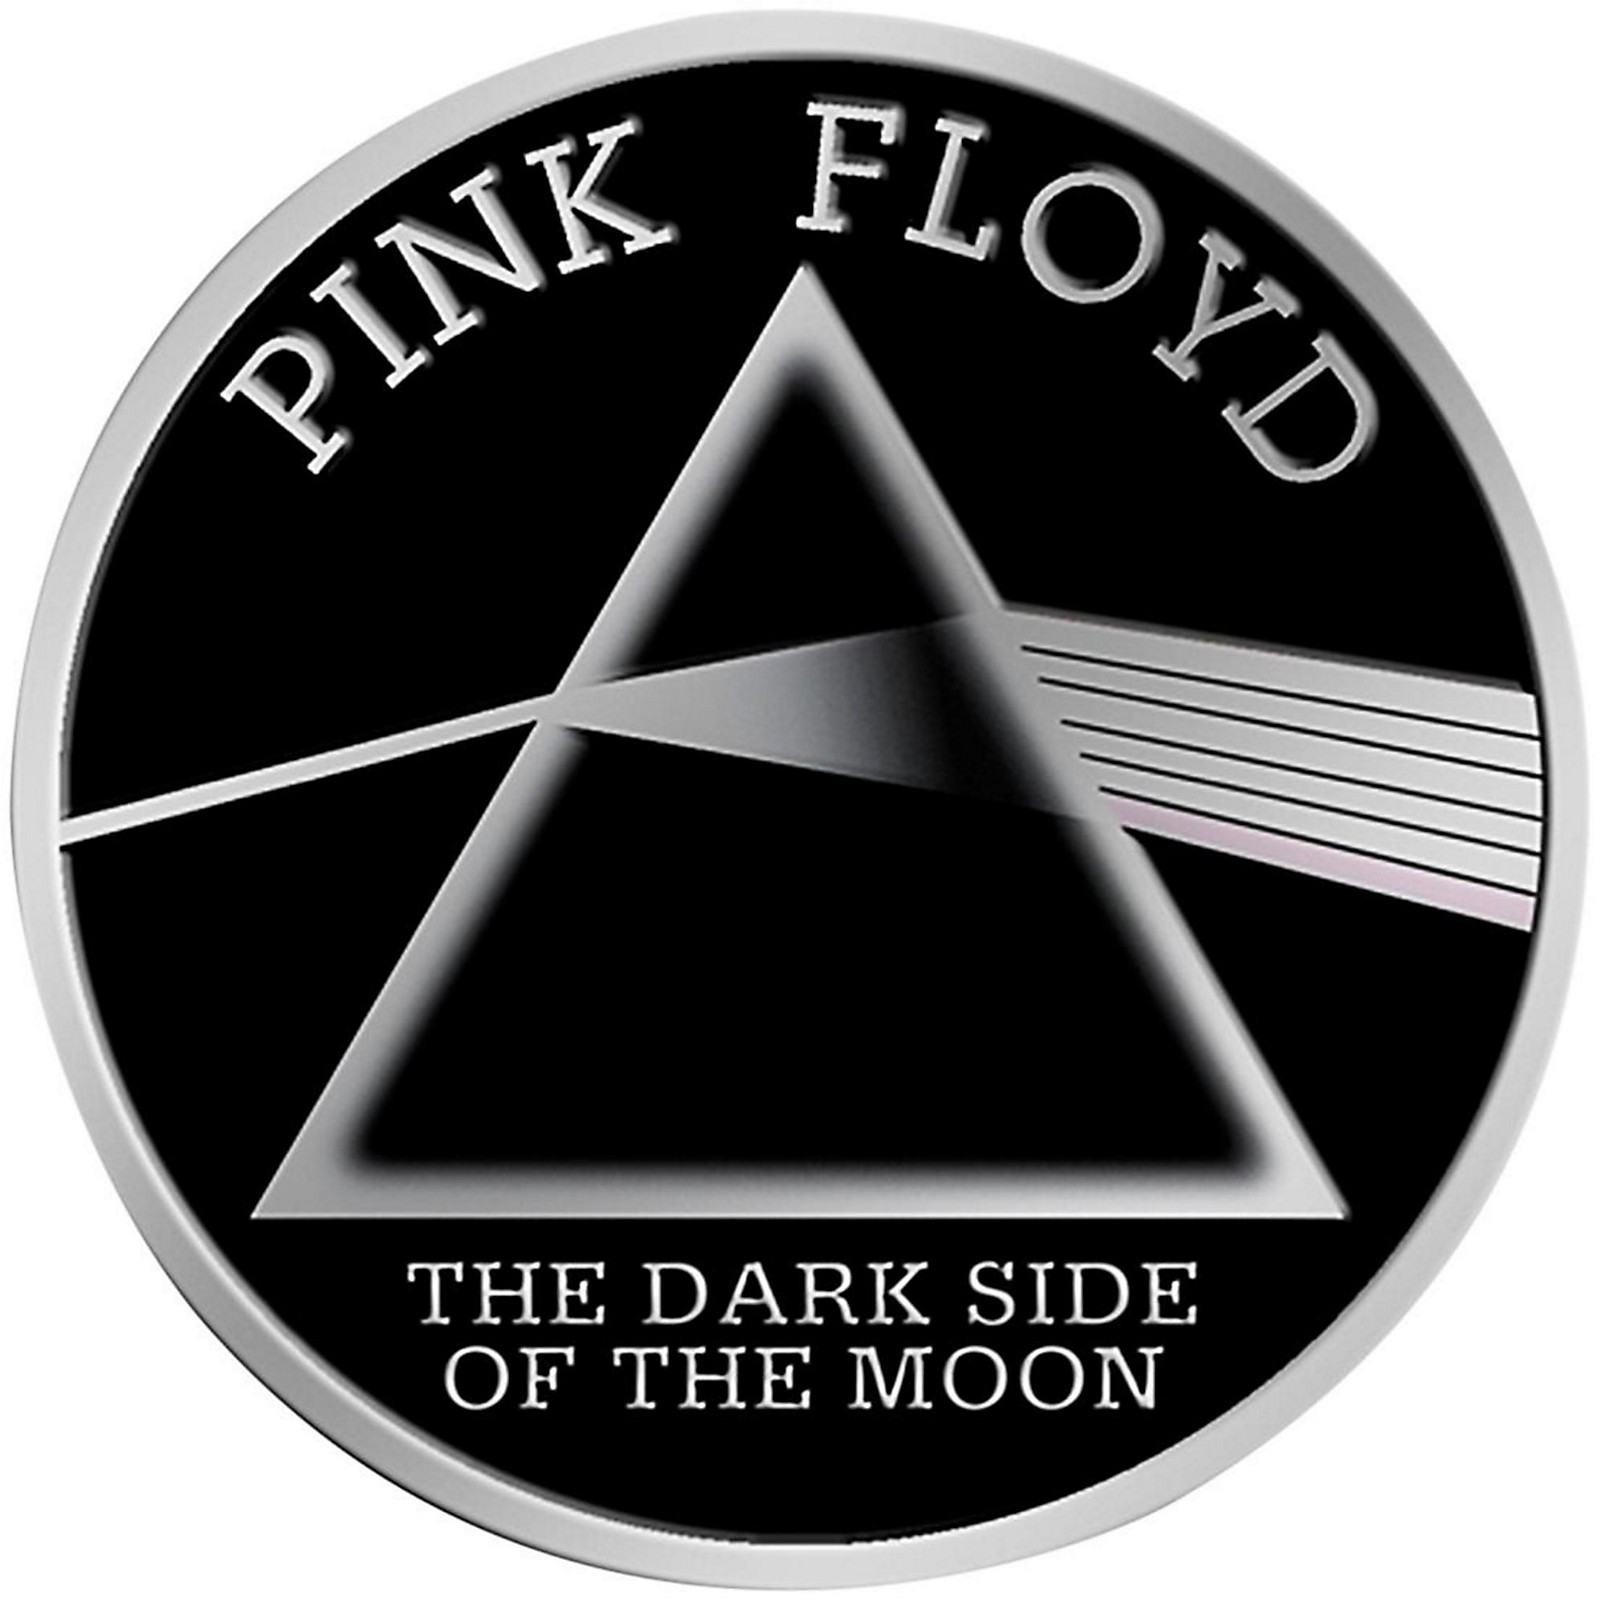 C&D Visionary Pink Floyd